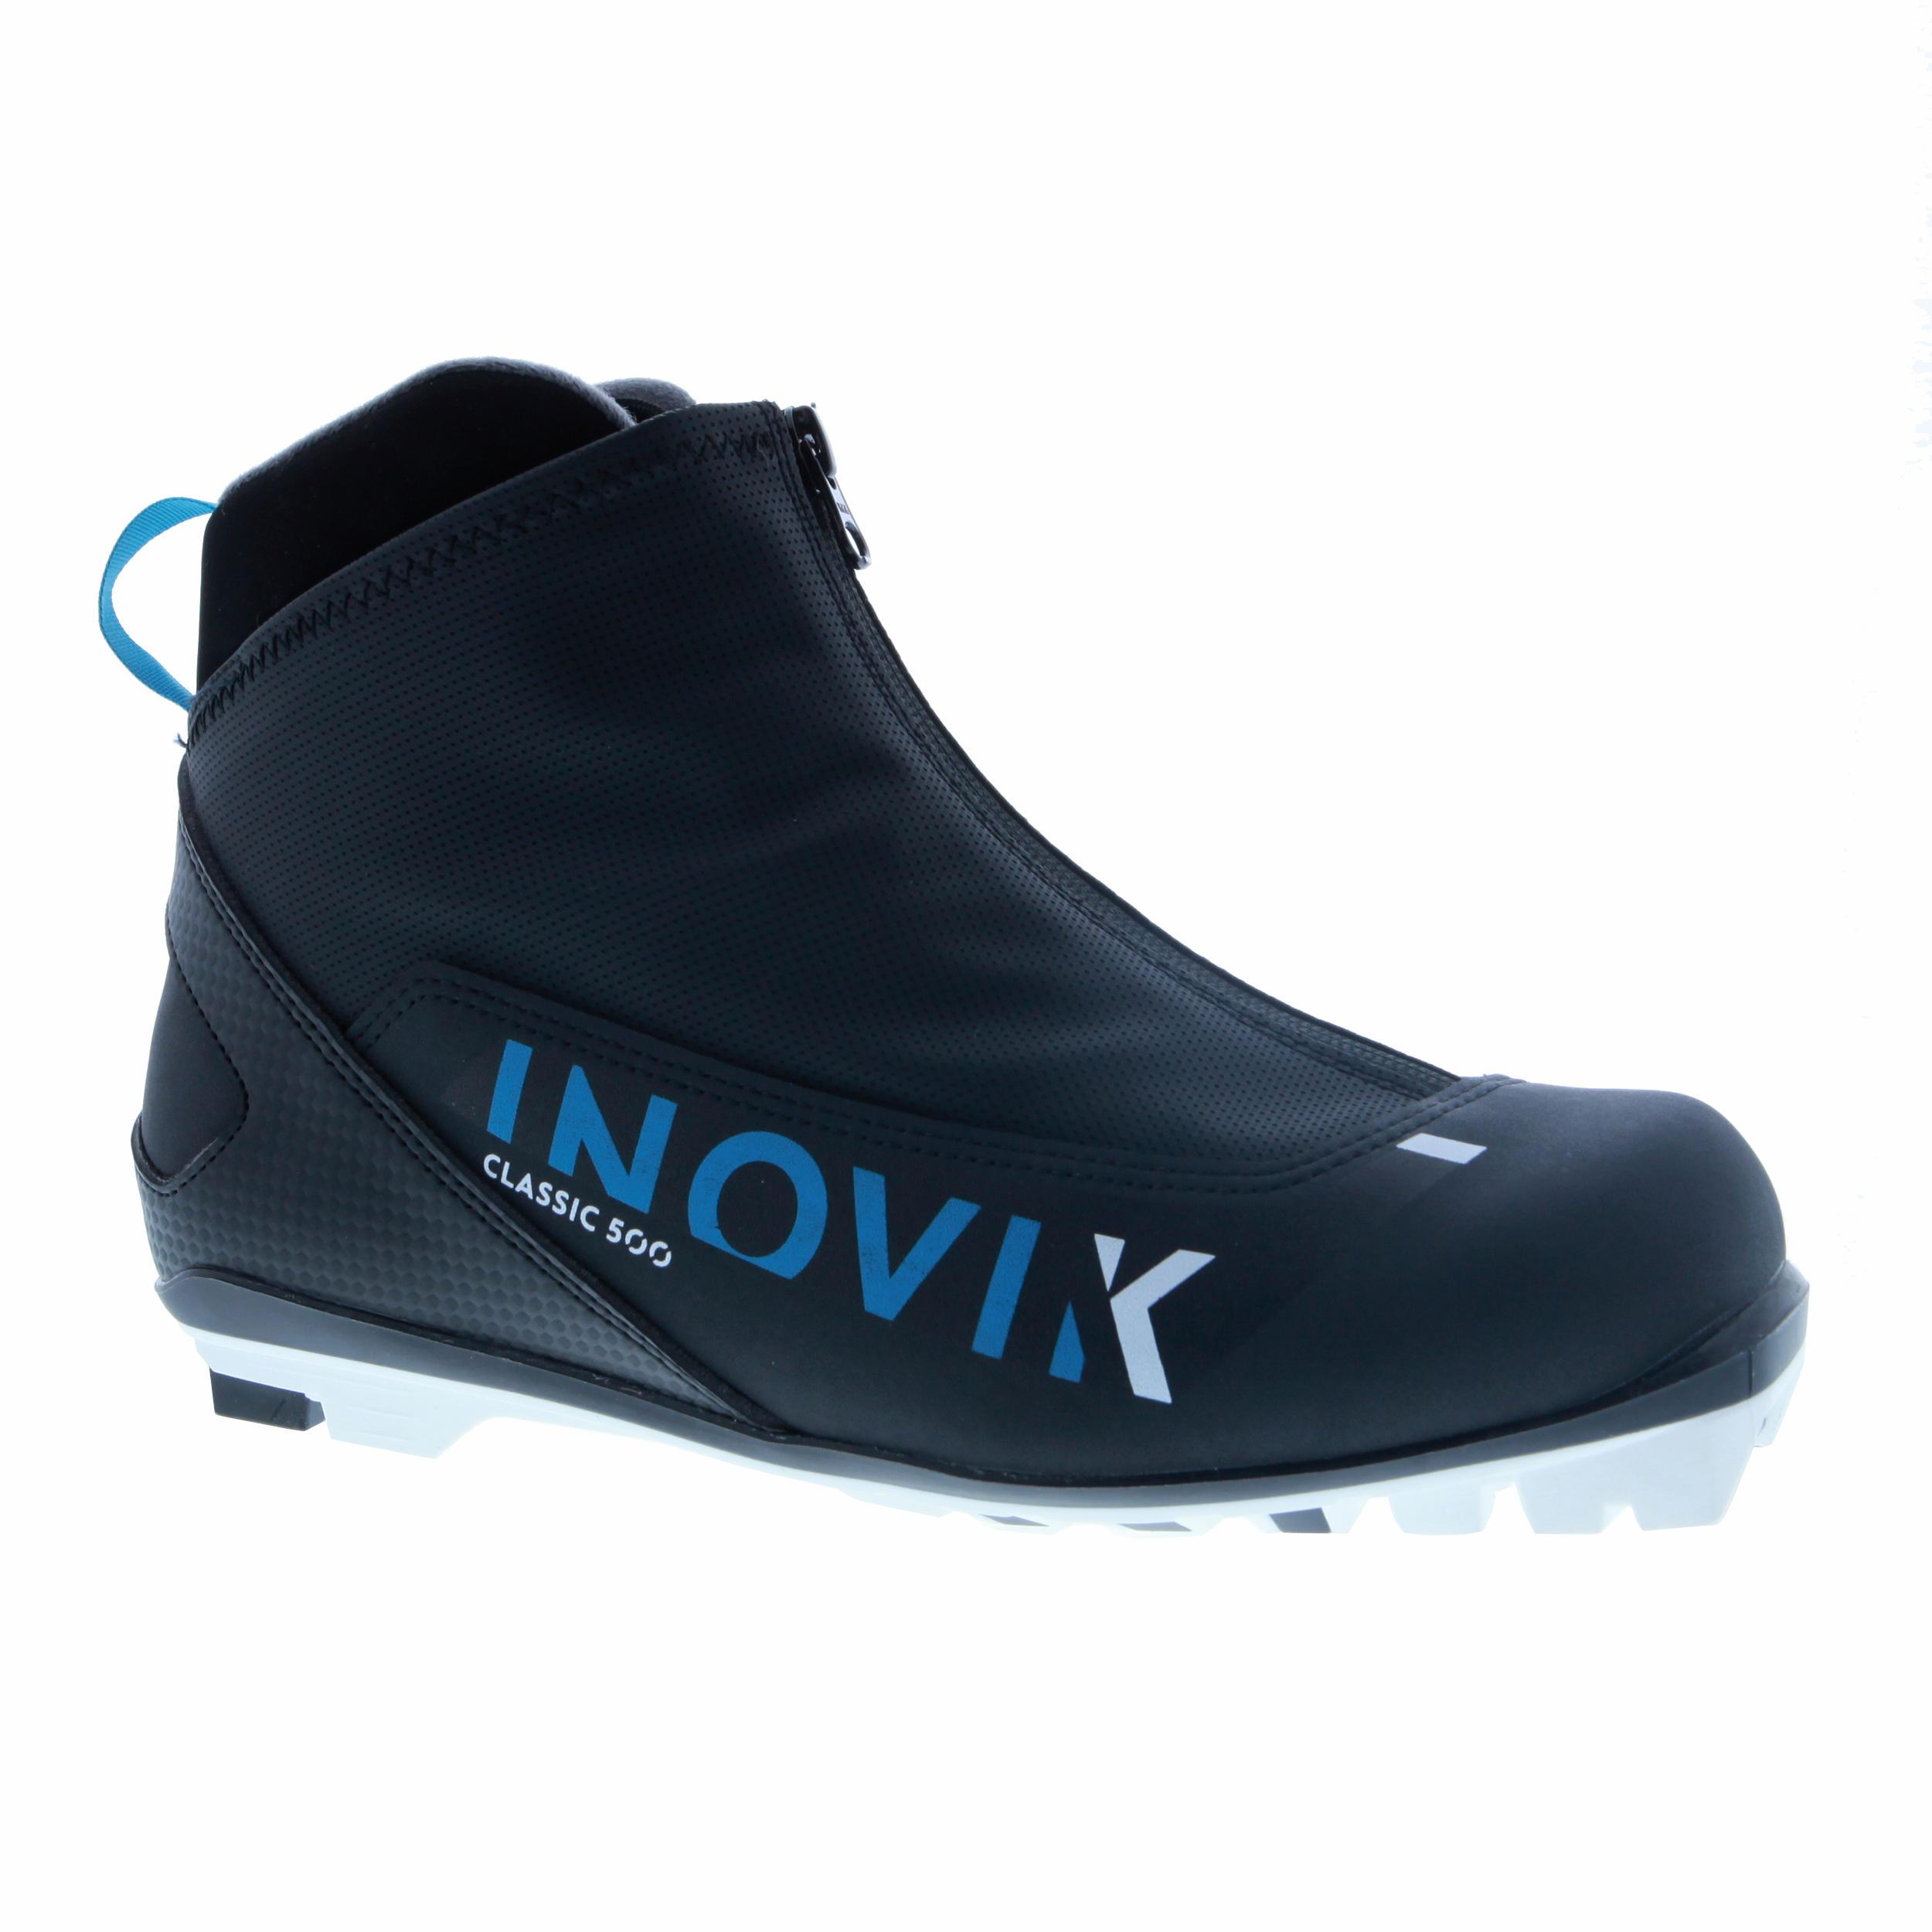 Inovik Chaussure de ski de fond classique XC S BOOTS 500 ADULTE - Inovik